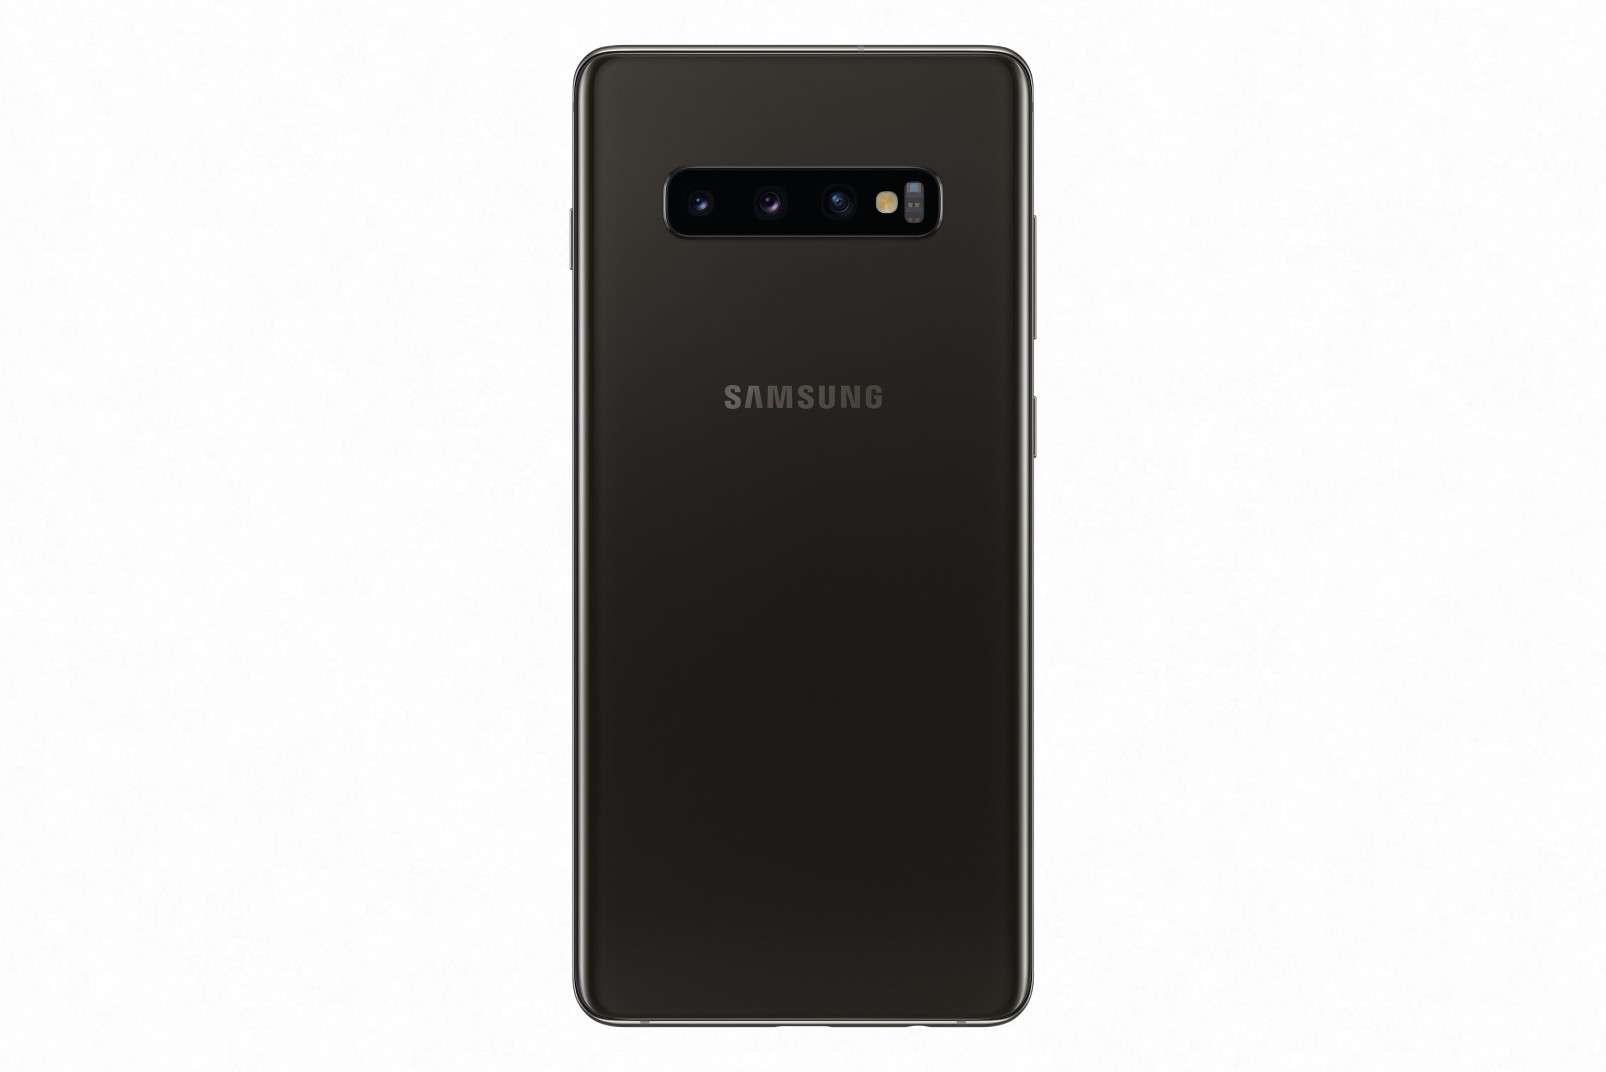 Samsung Galaxy S10 Plus Ceramic Black, back